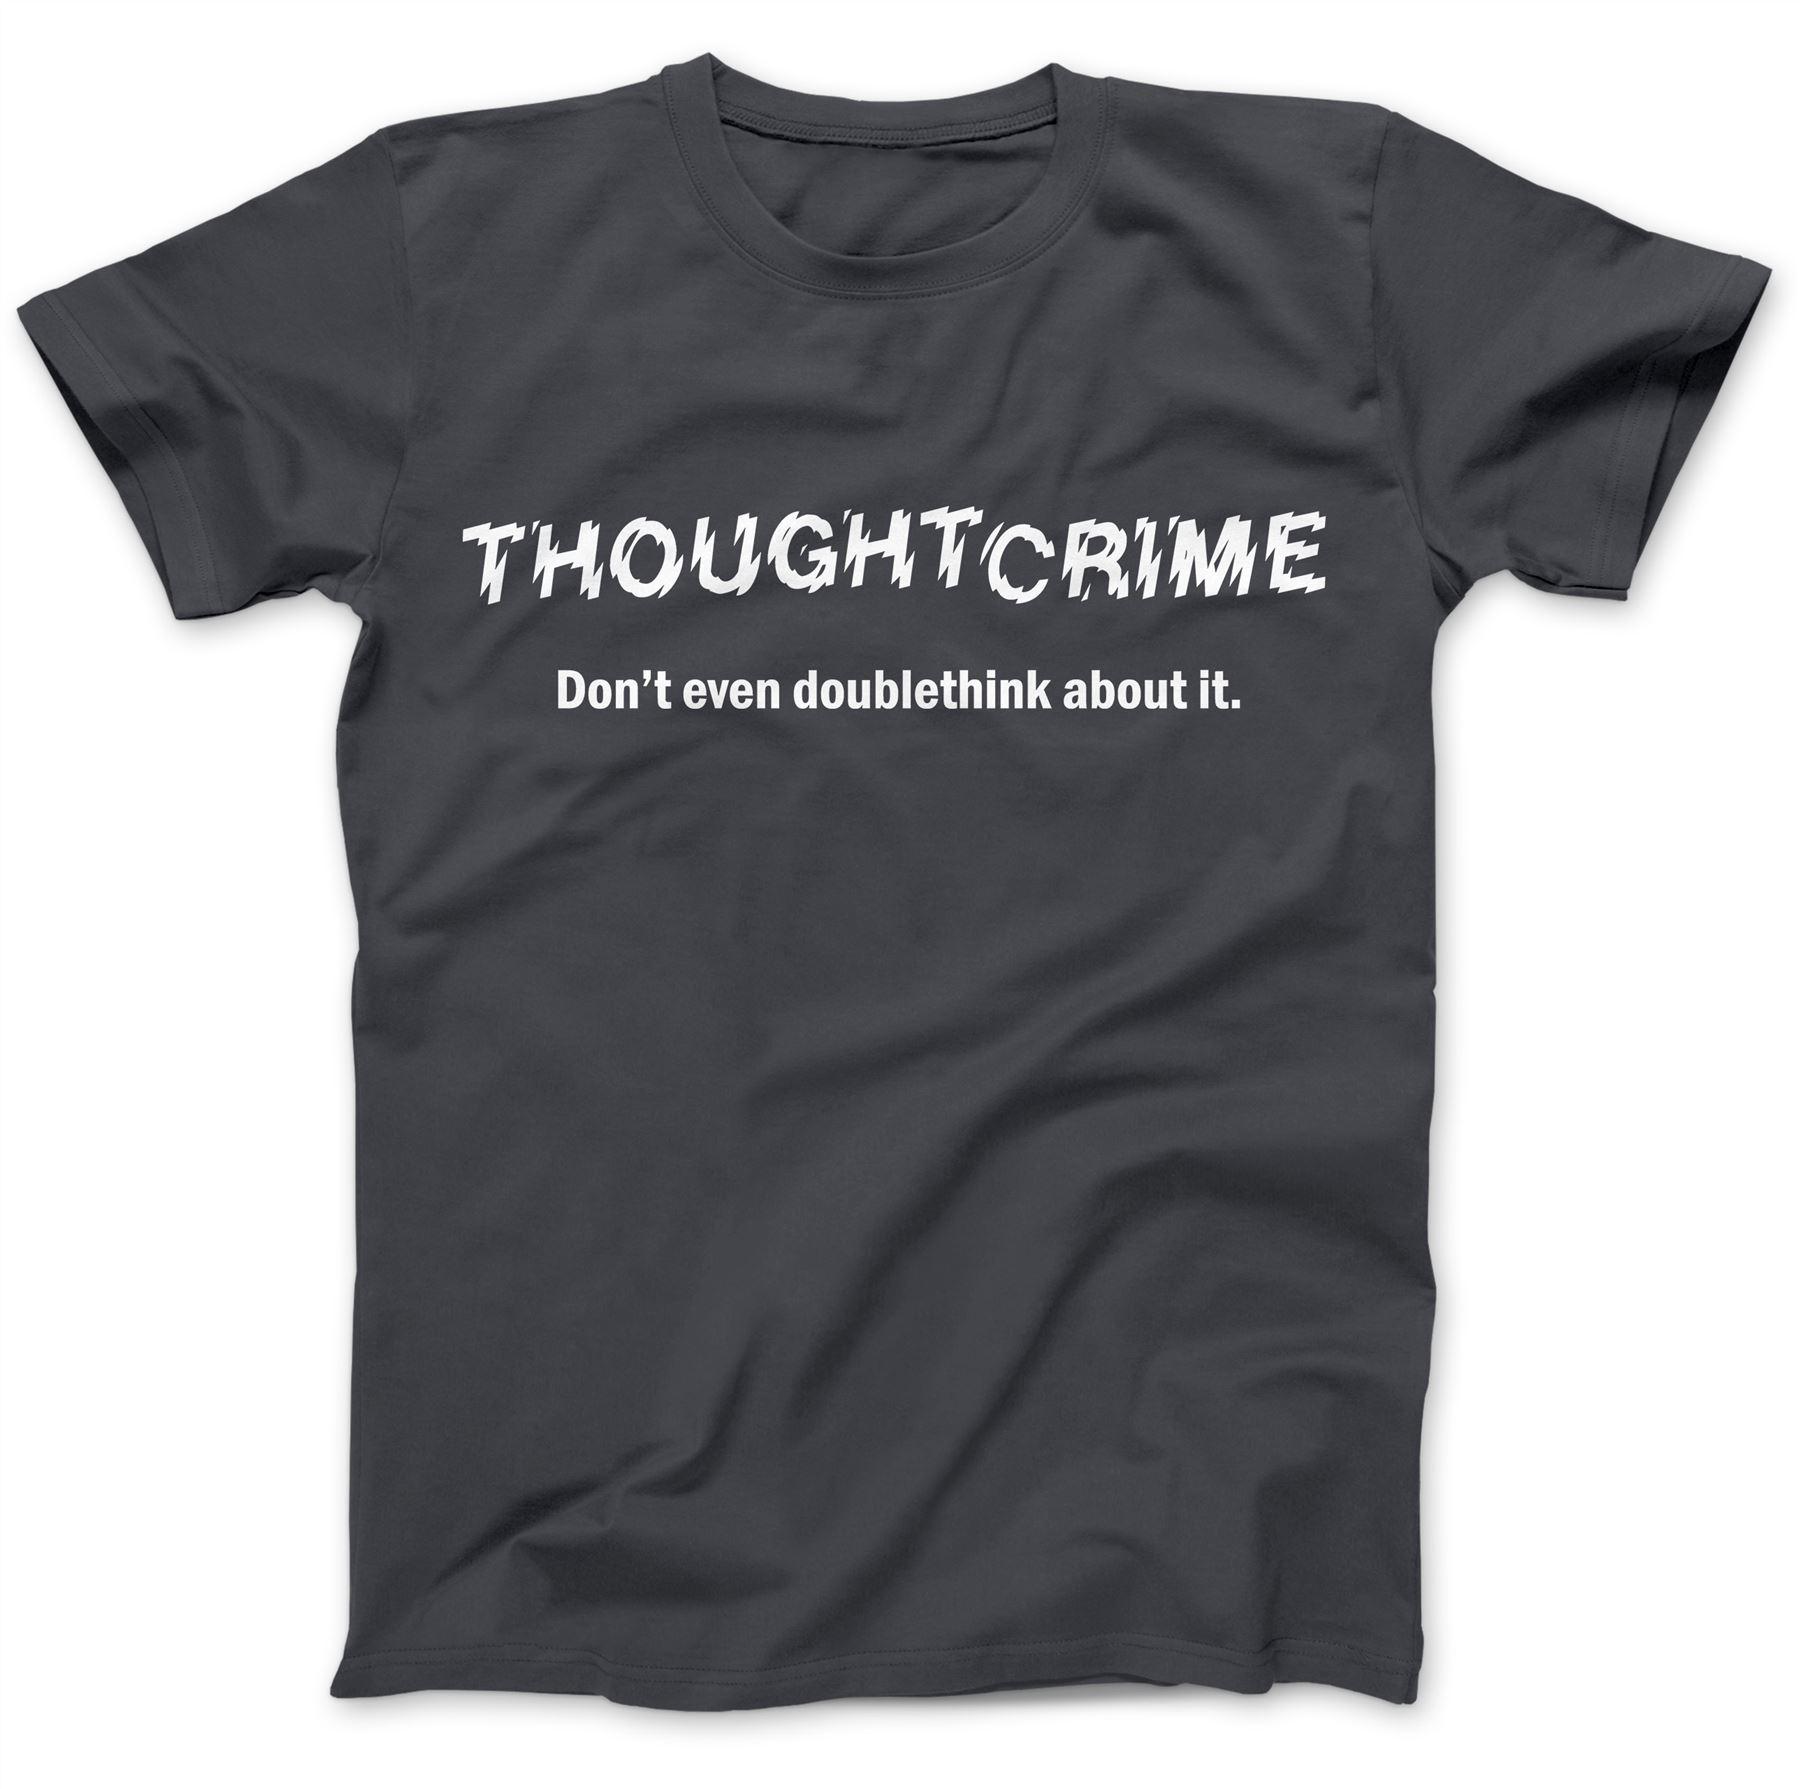 1984-Thought-Crime-George-Orwell-T-Shirt-100-Premium-Cotton-Animal-Farm miniatuur 11